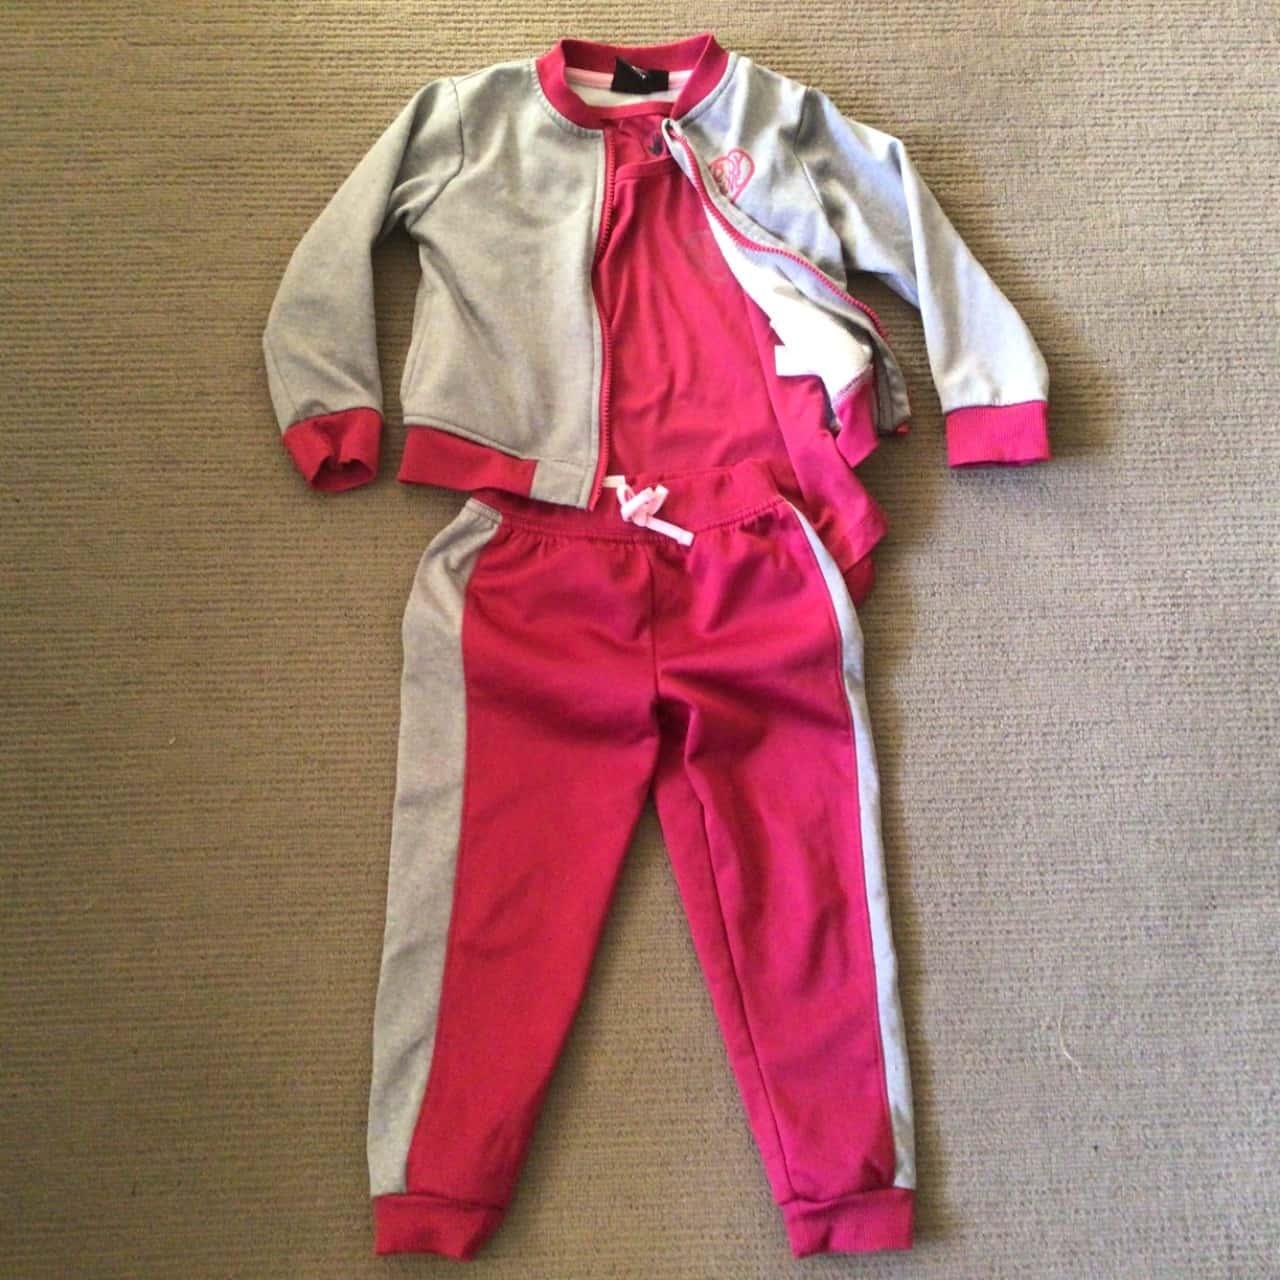 NWOT Girls 3 PCE TRACKSUIT  Size 4 Sportswear Grey/Pink